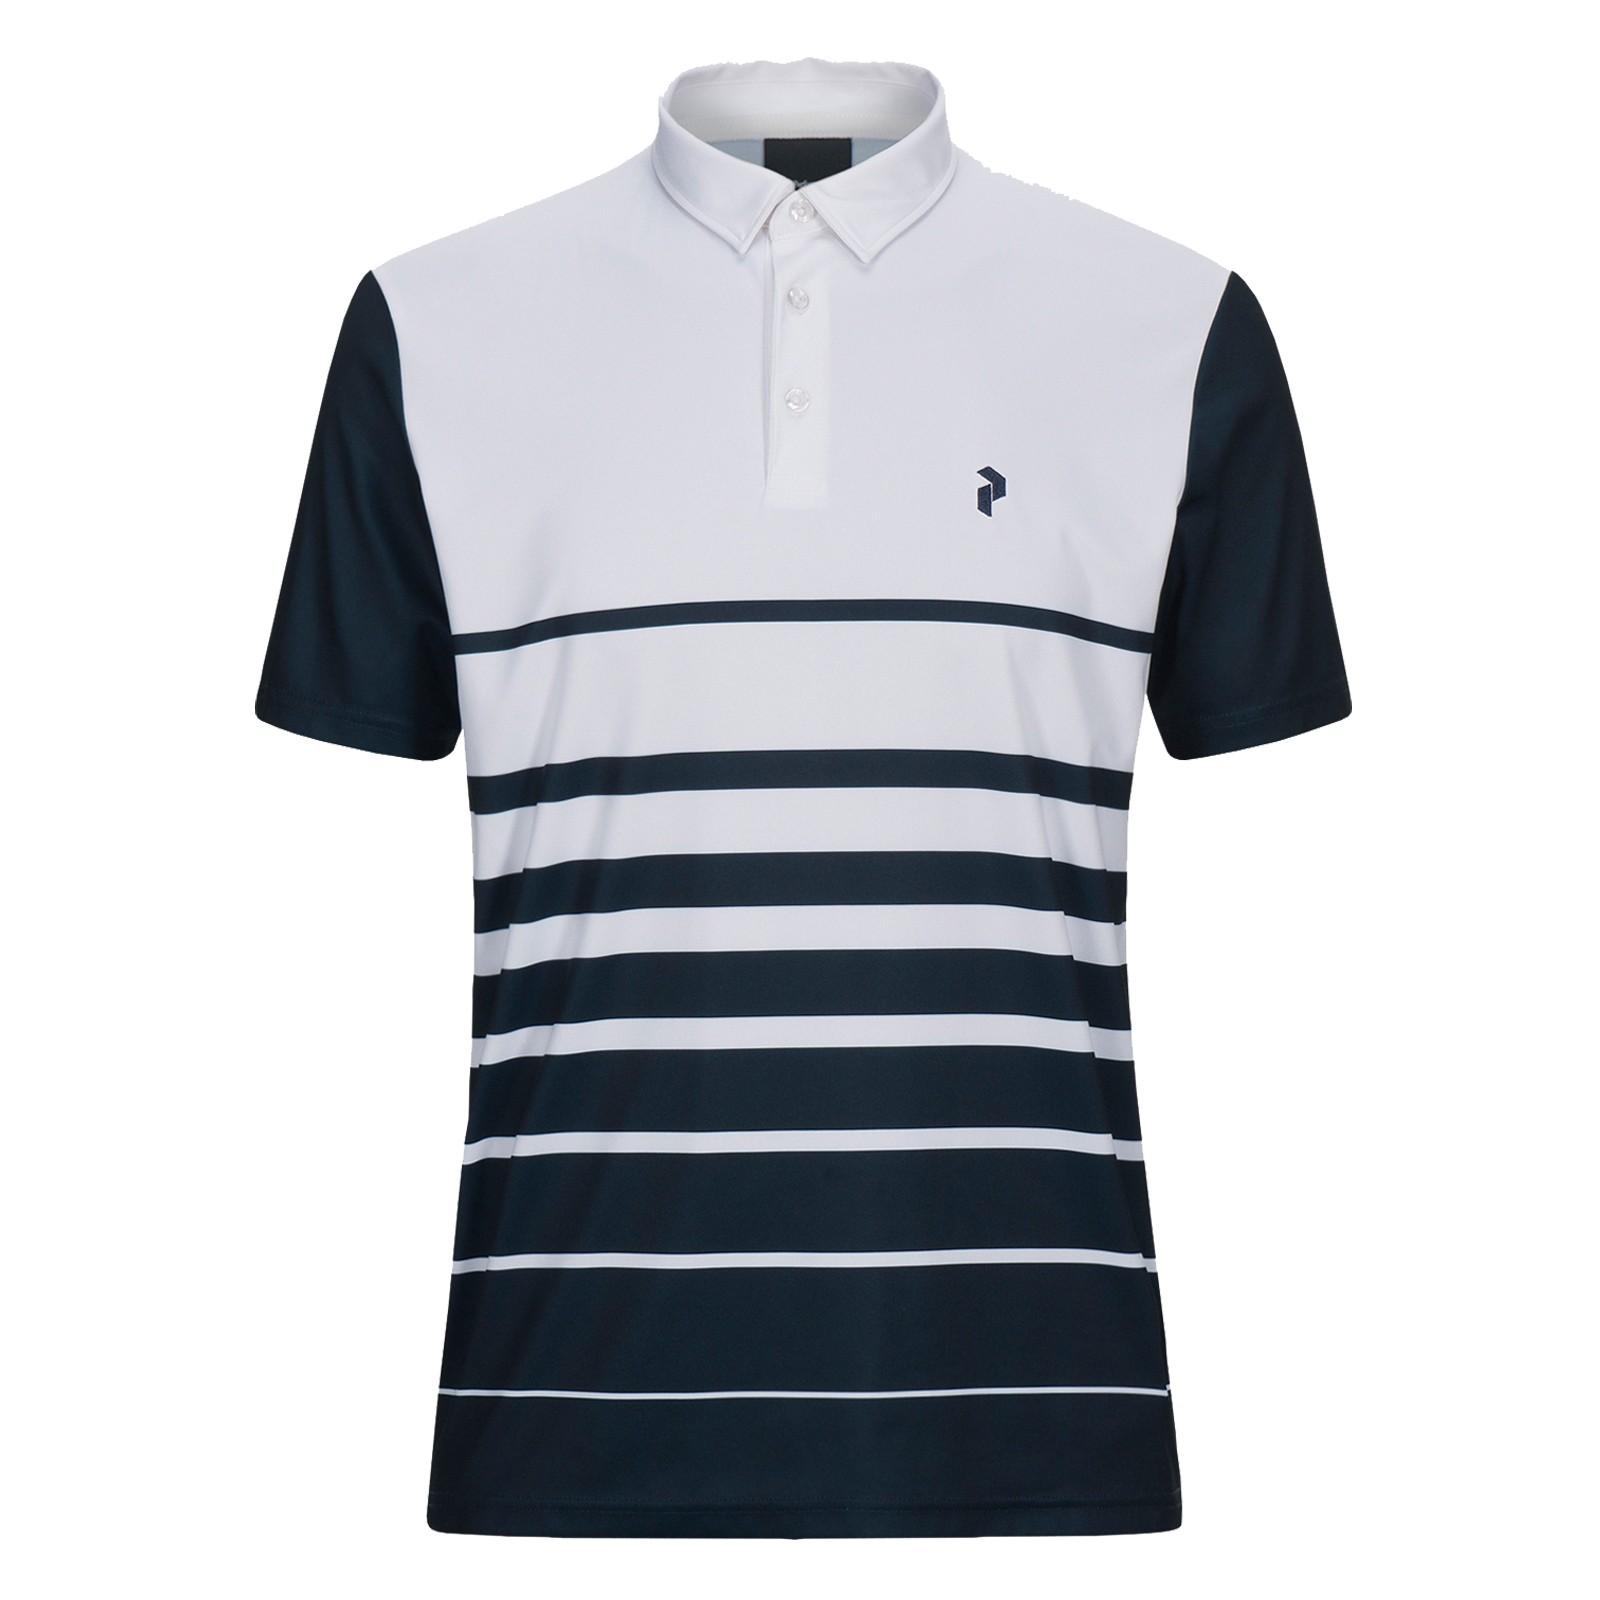 Peak Performance Bandon Polo Shirts